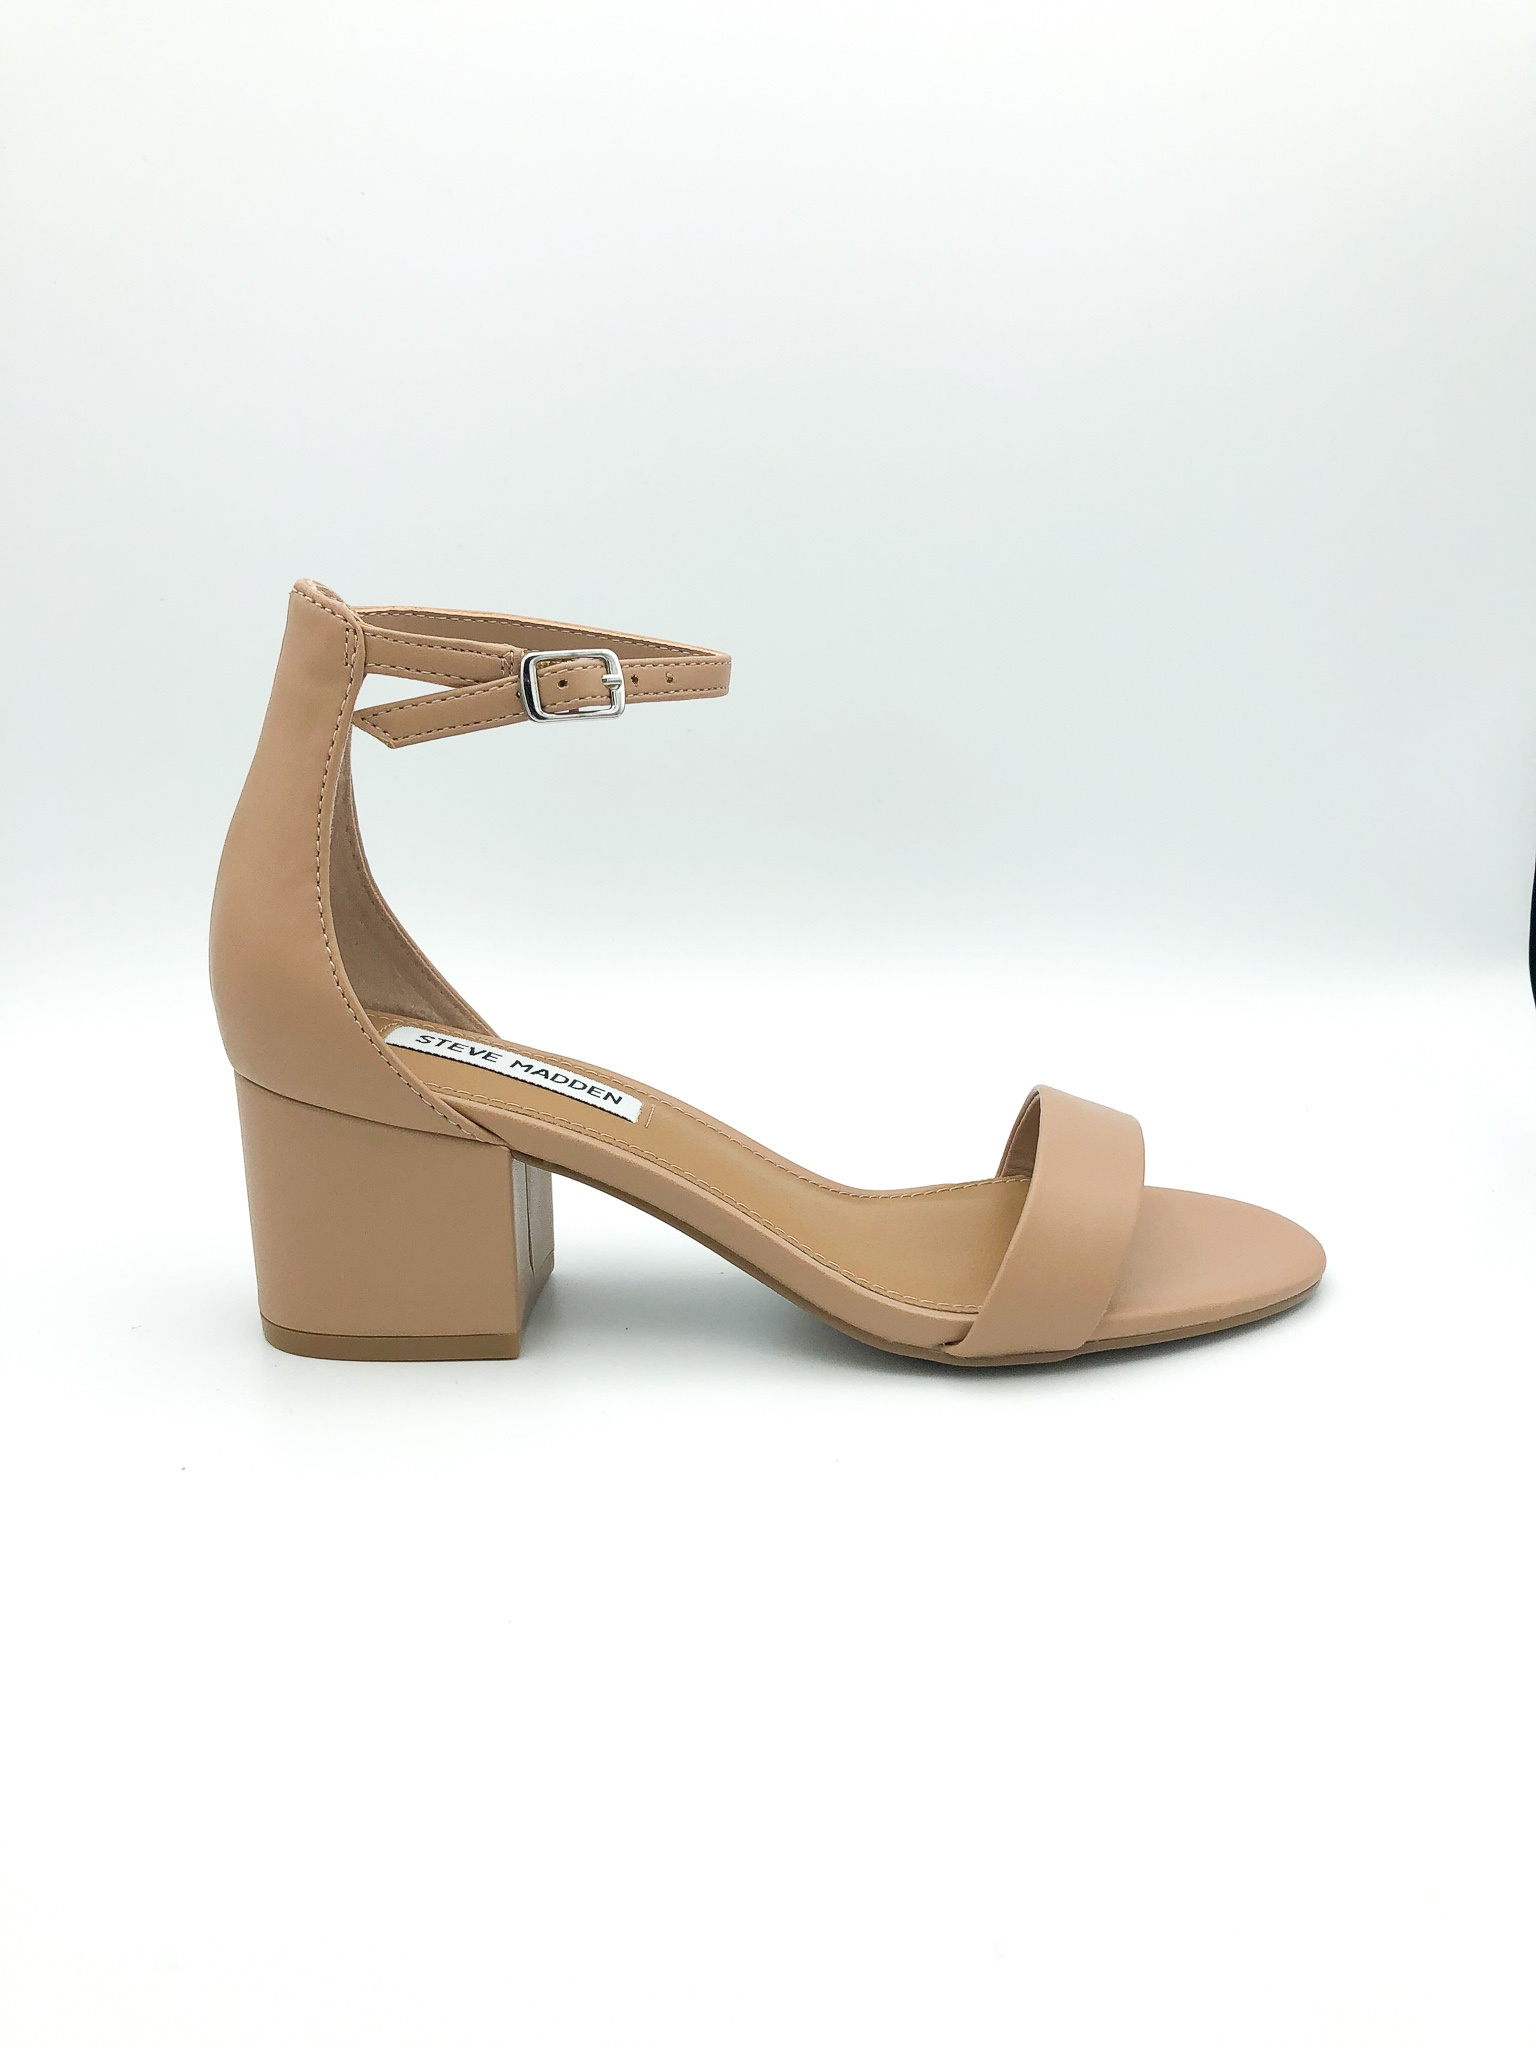 caab7e6b20a9 STEVE MADDEN- IRENEE IN BLUSH SMOOTH - the Urban Shoe Myth